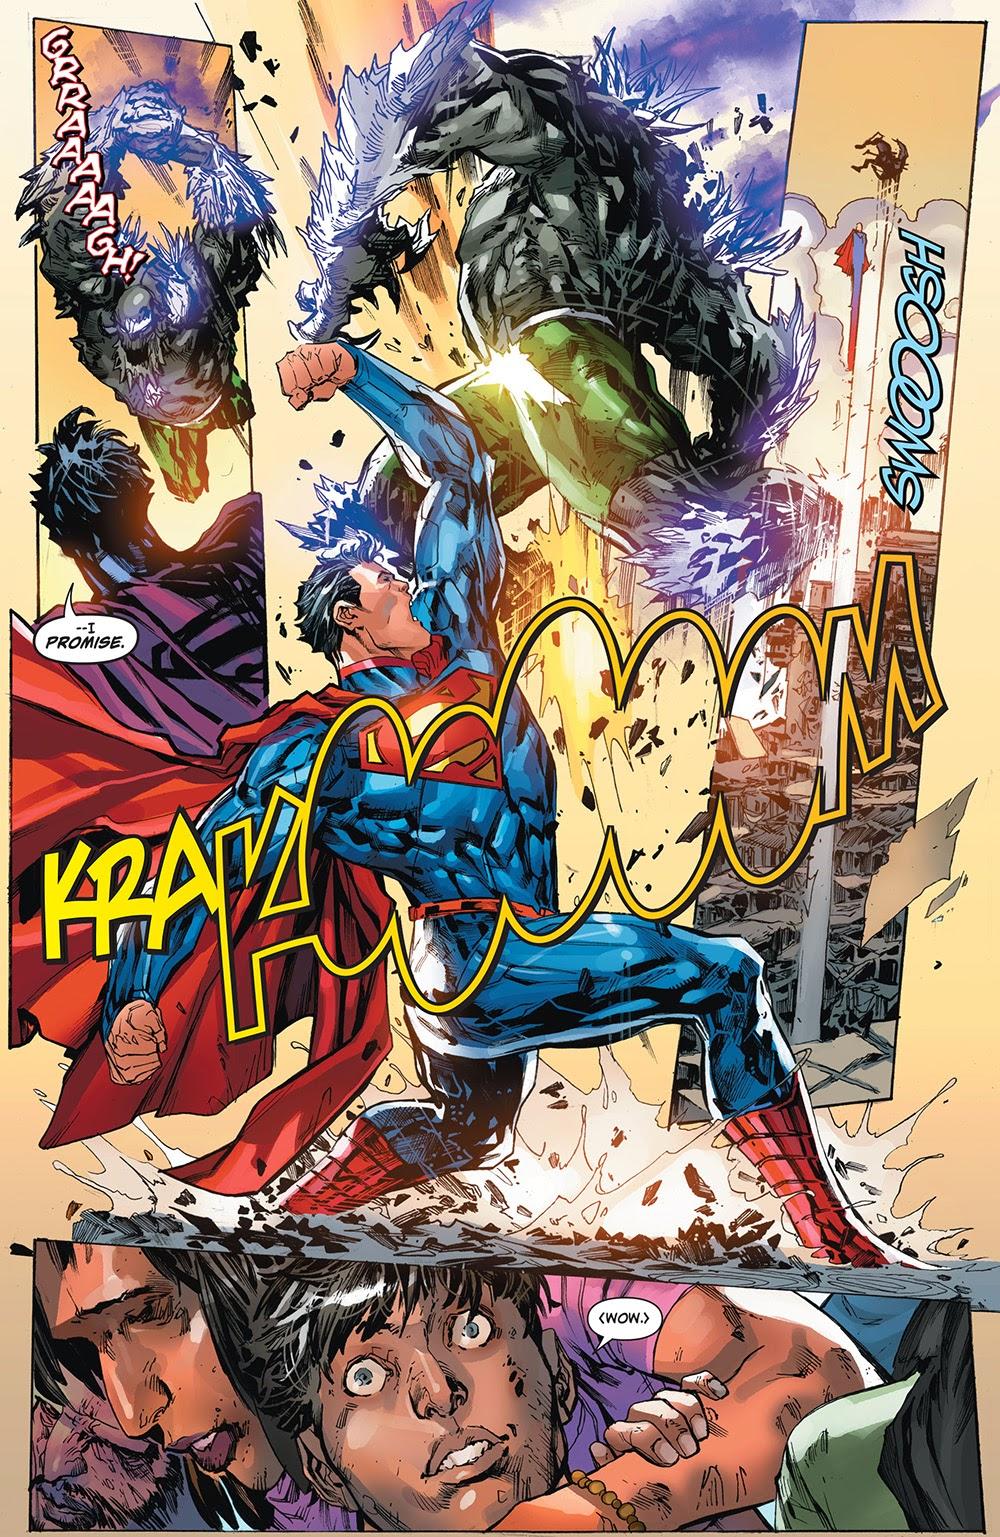 Superman (New 52) vs Endbringers (Leviathan, Simurgh